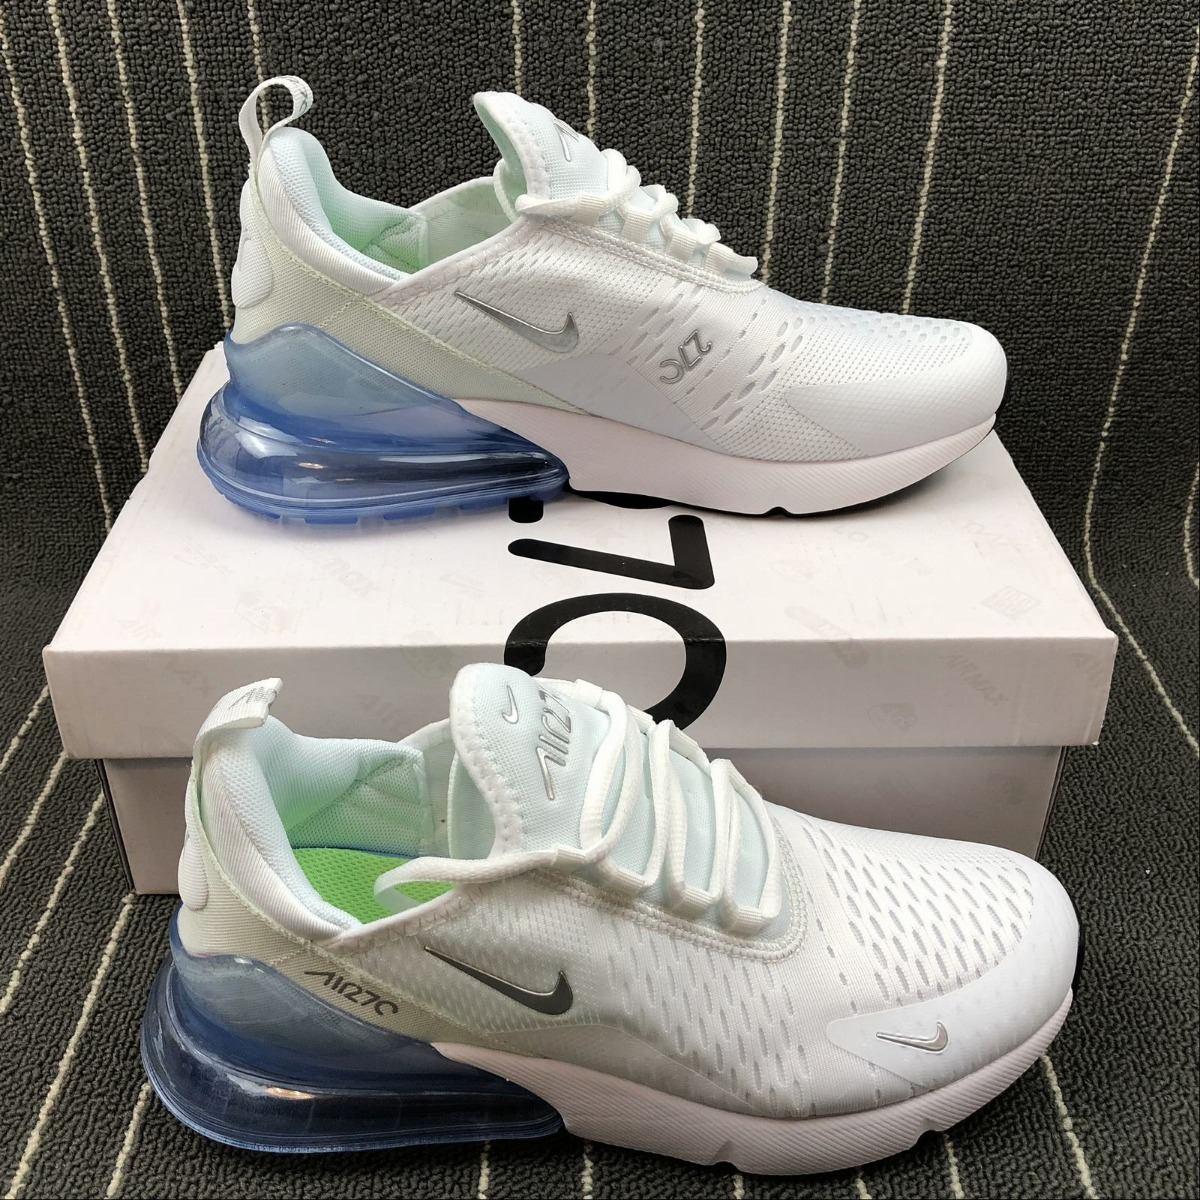 7a98158bfa zapatillas nike air max 270 white 40-45 exclusive line. Cargando zoom.